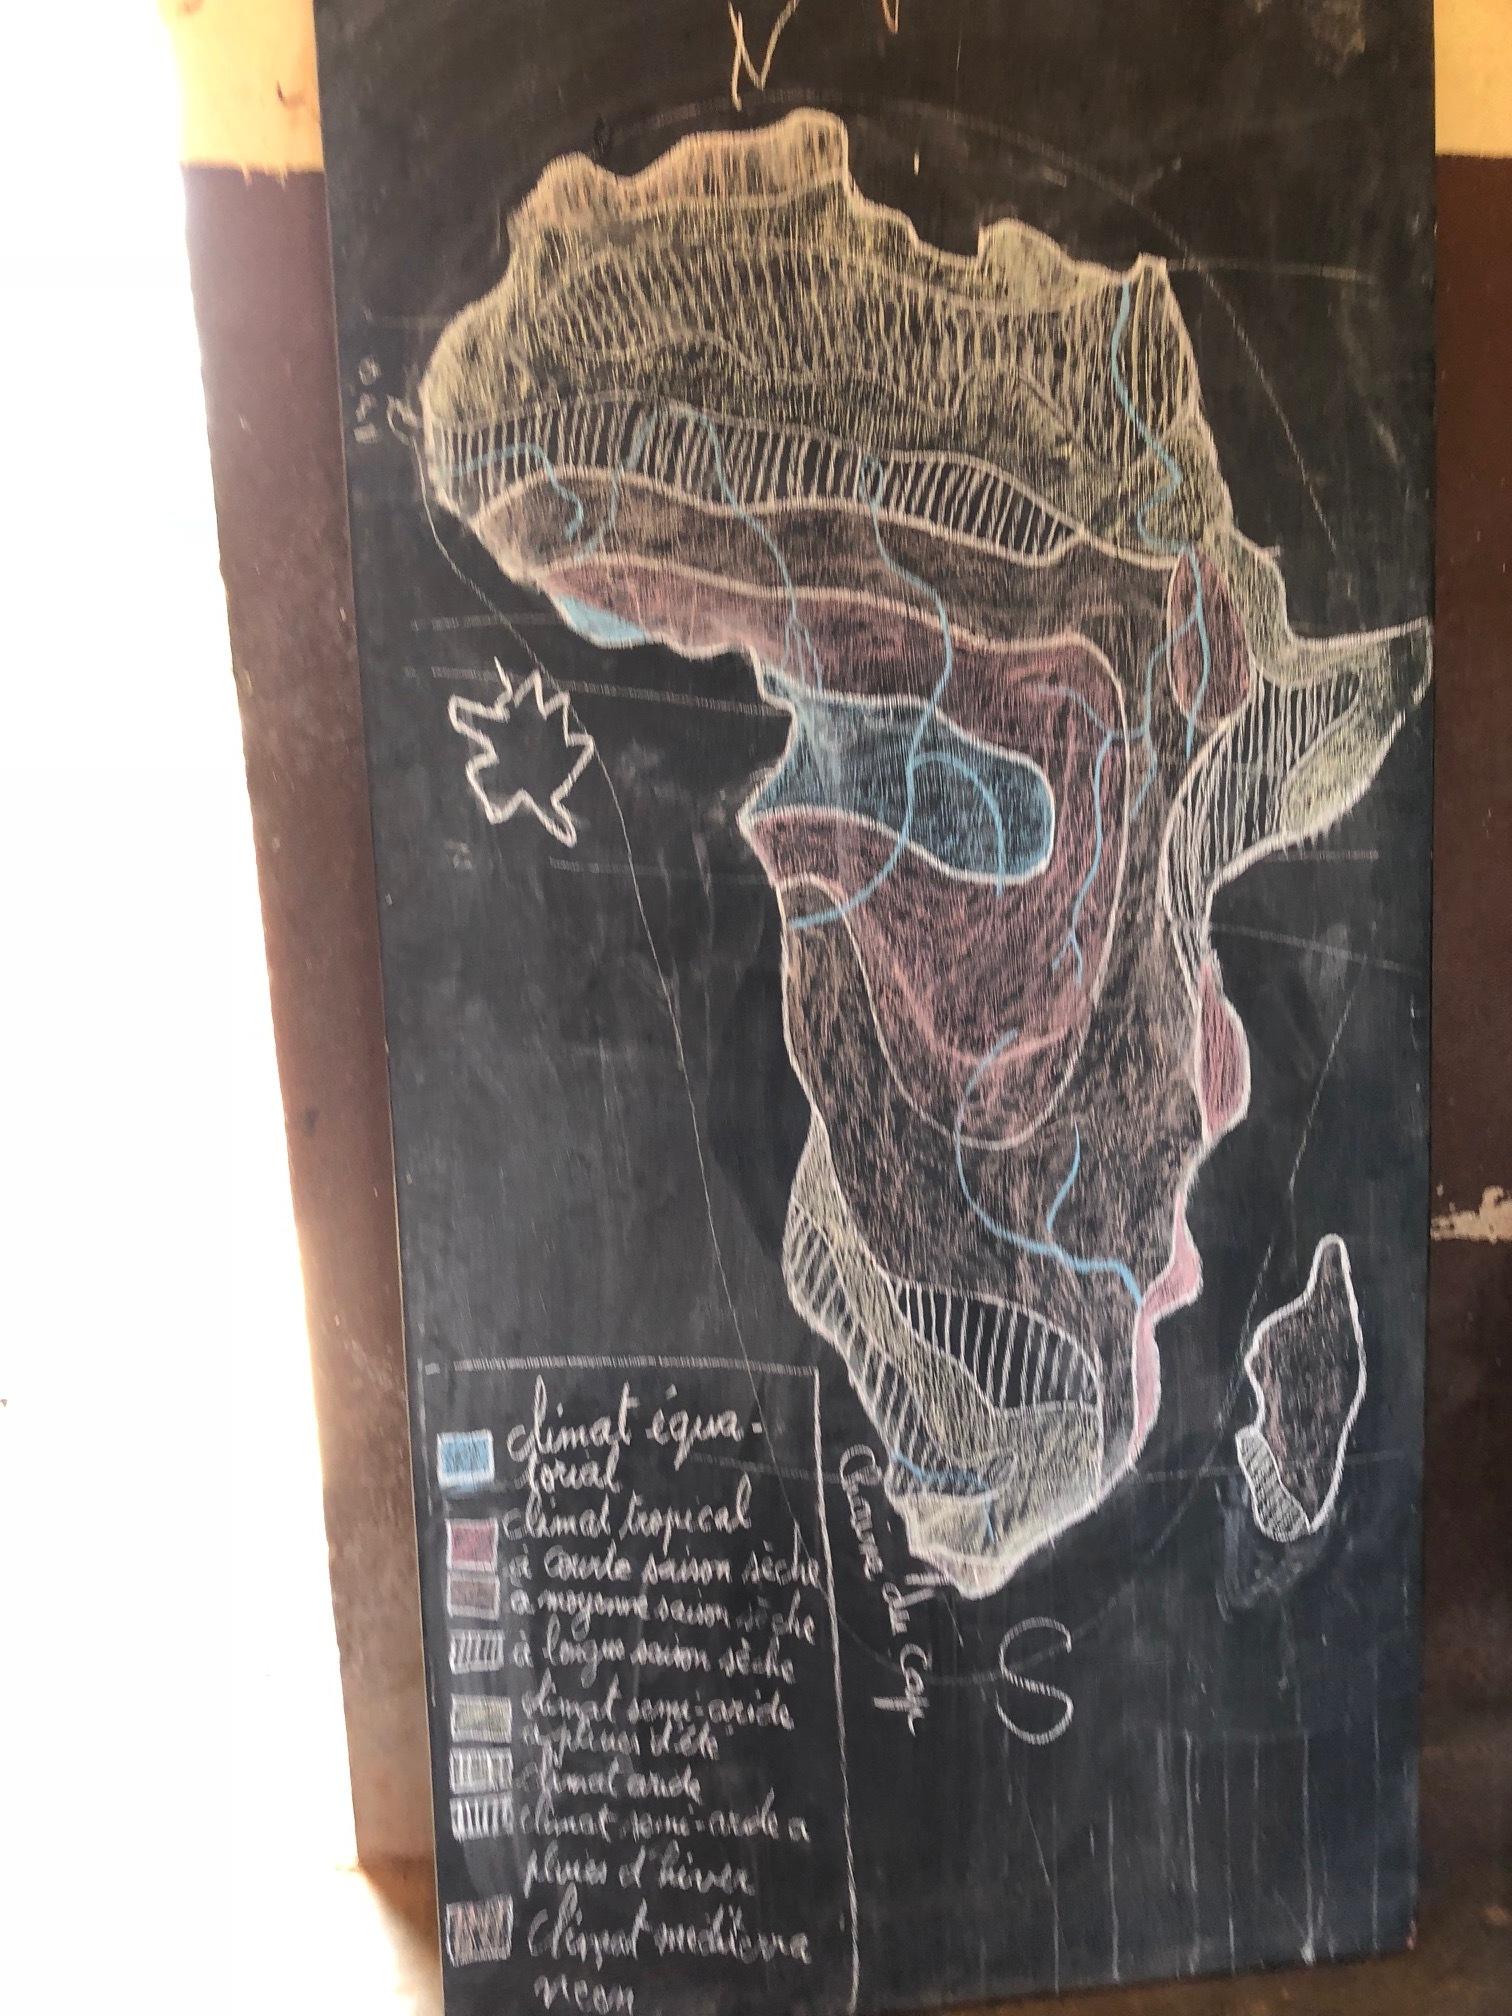 Our teachers make the most beautiful chalkboard art.